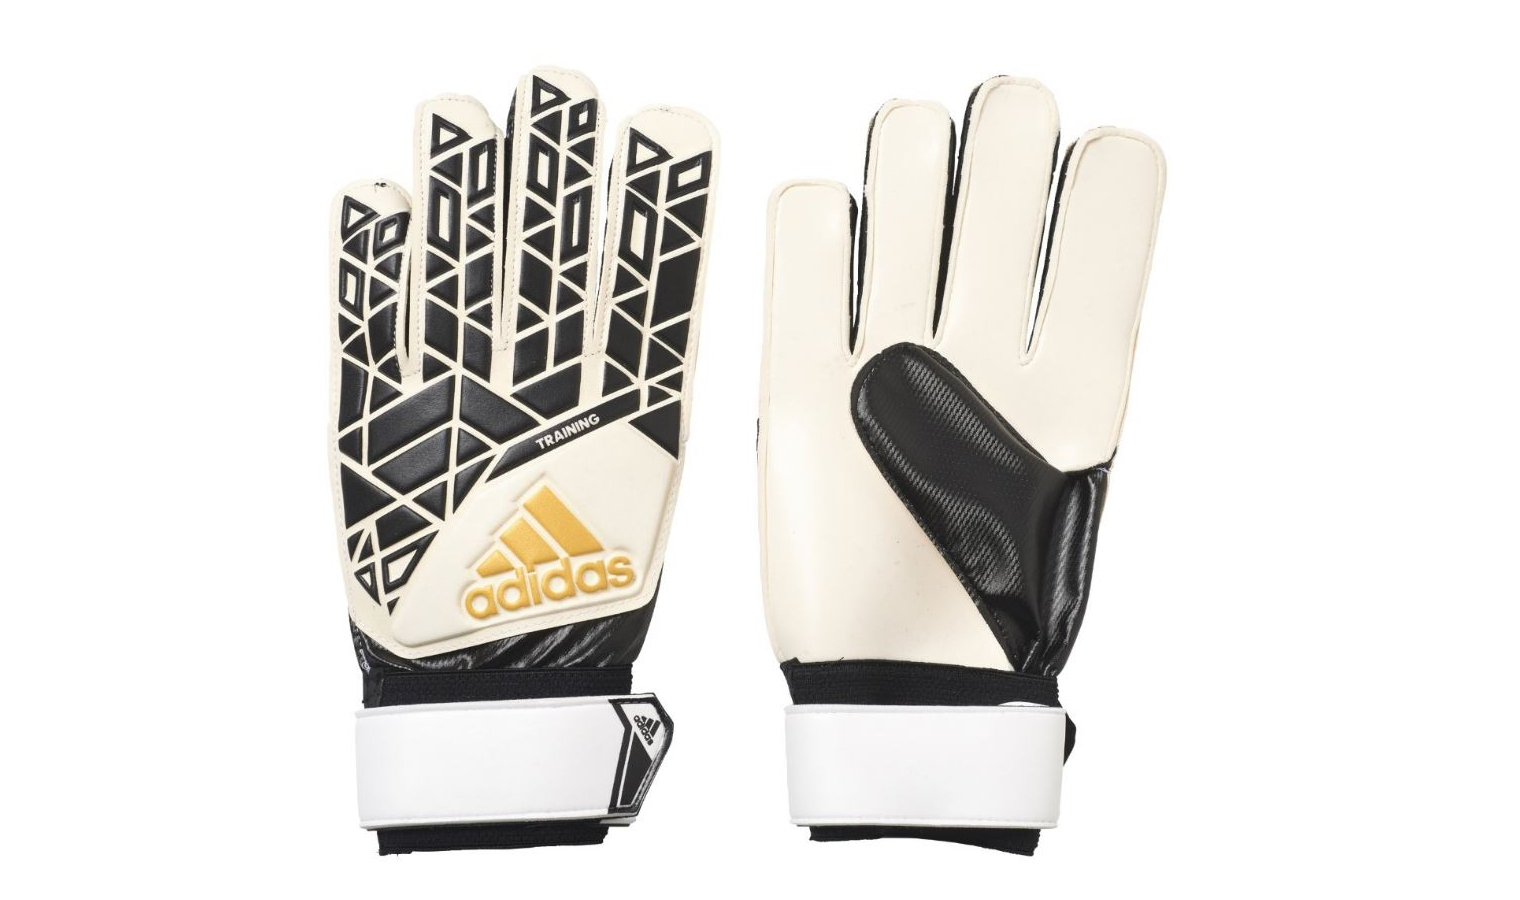 a22032232 Brankárske rukavice adidas ACE TRAINING biele / čierne | AD Sport.sk